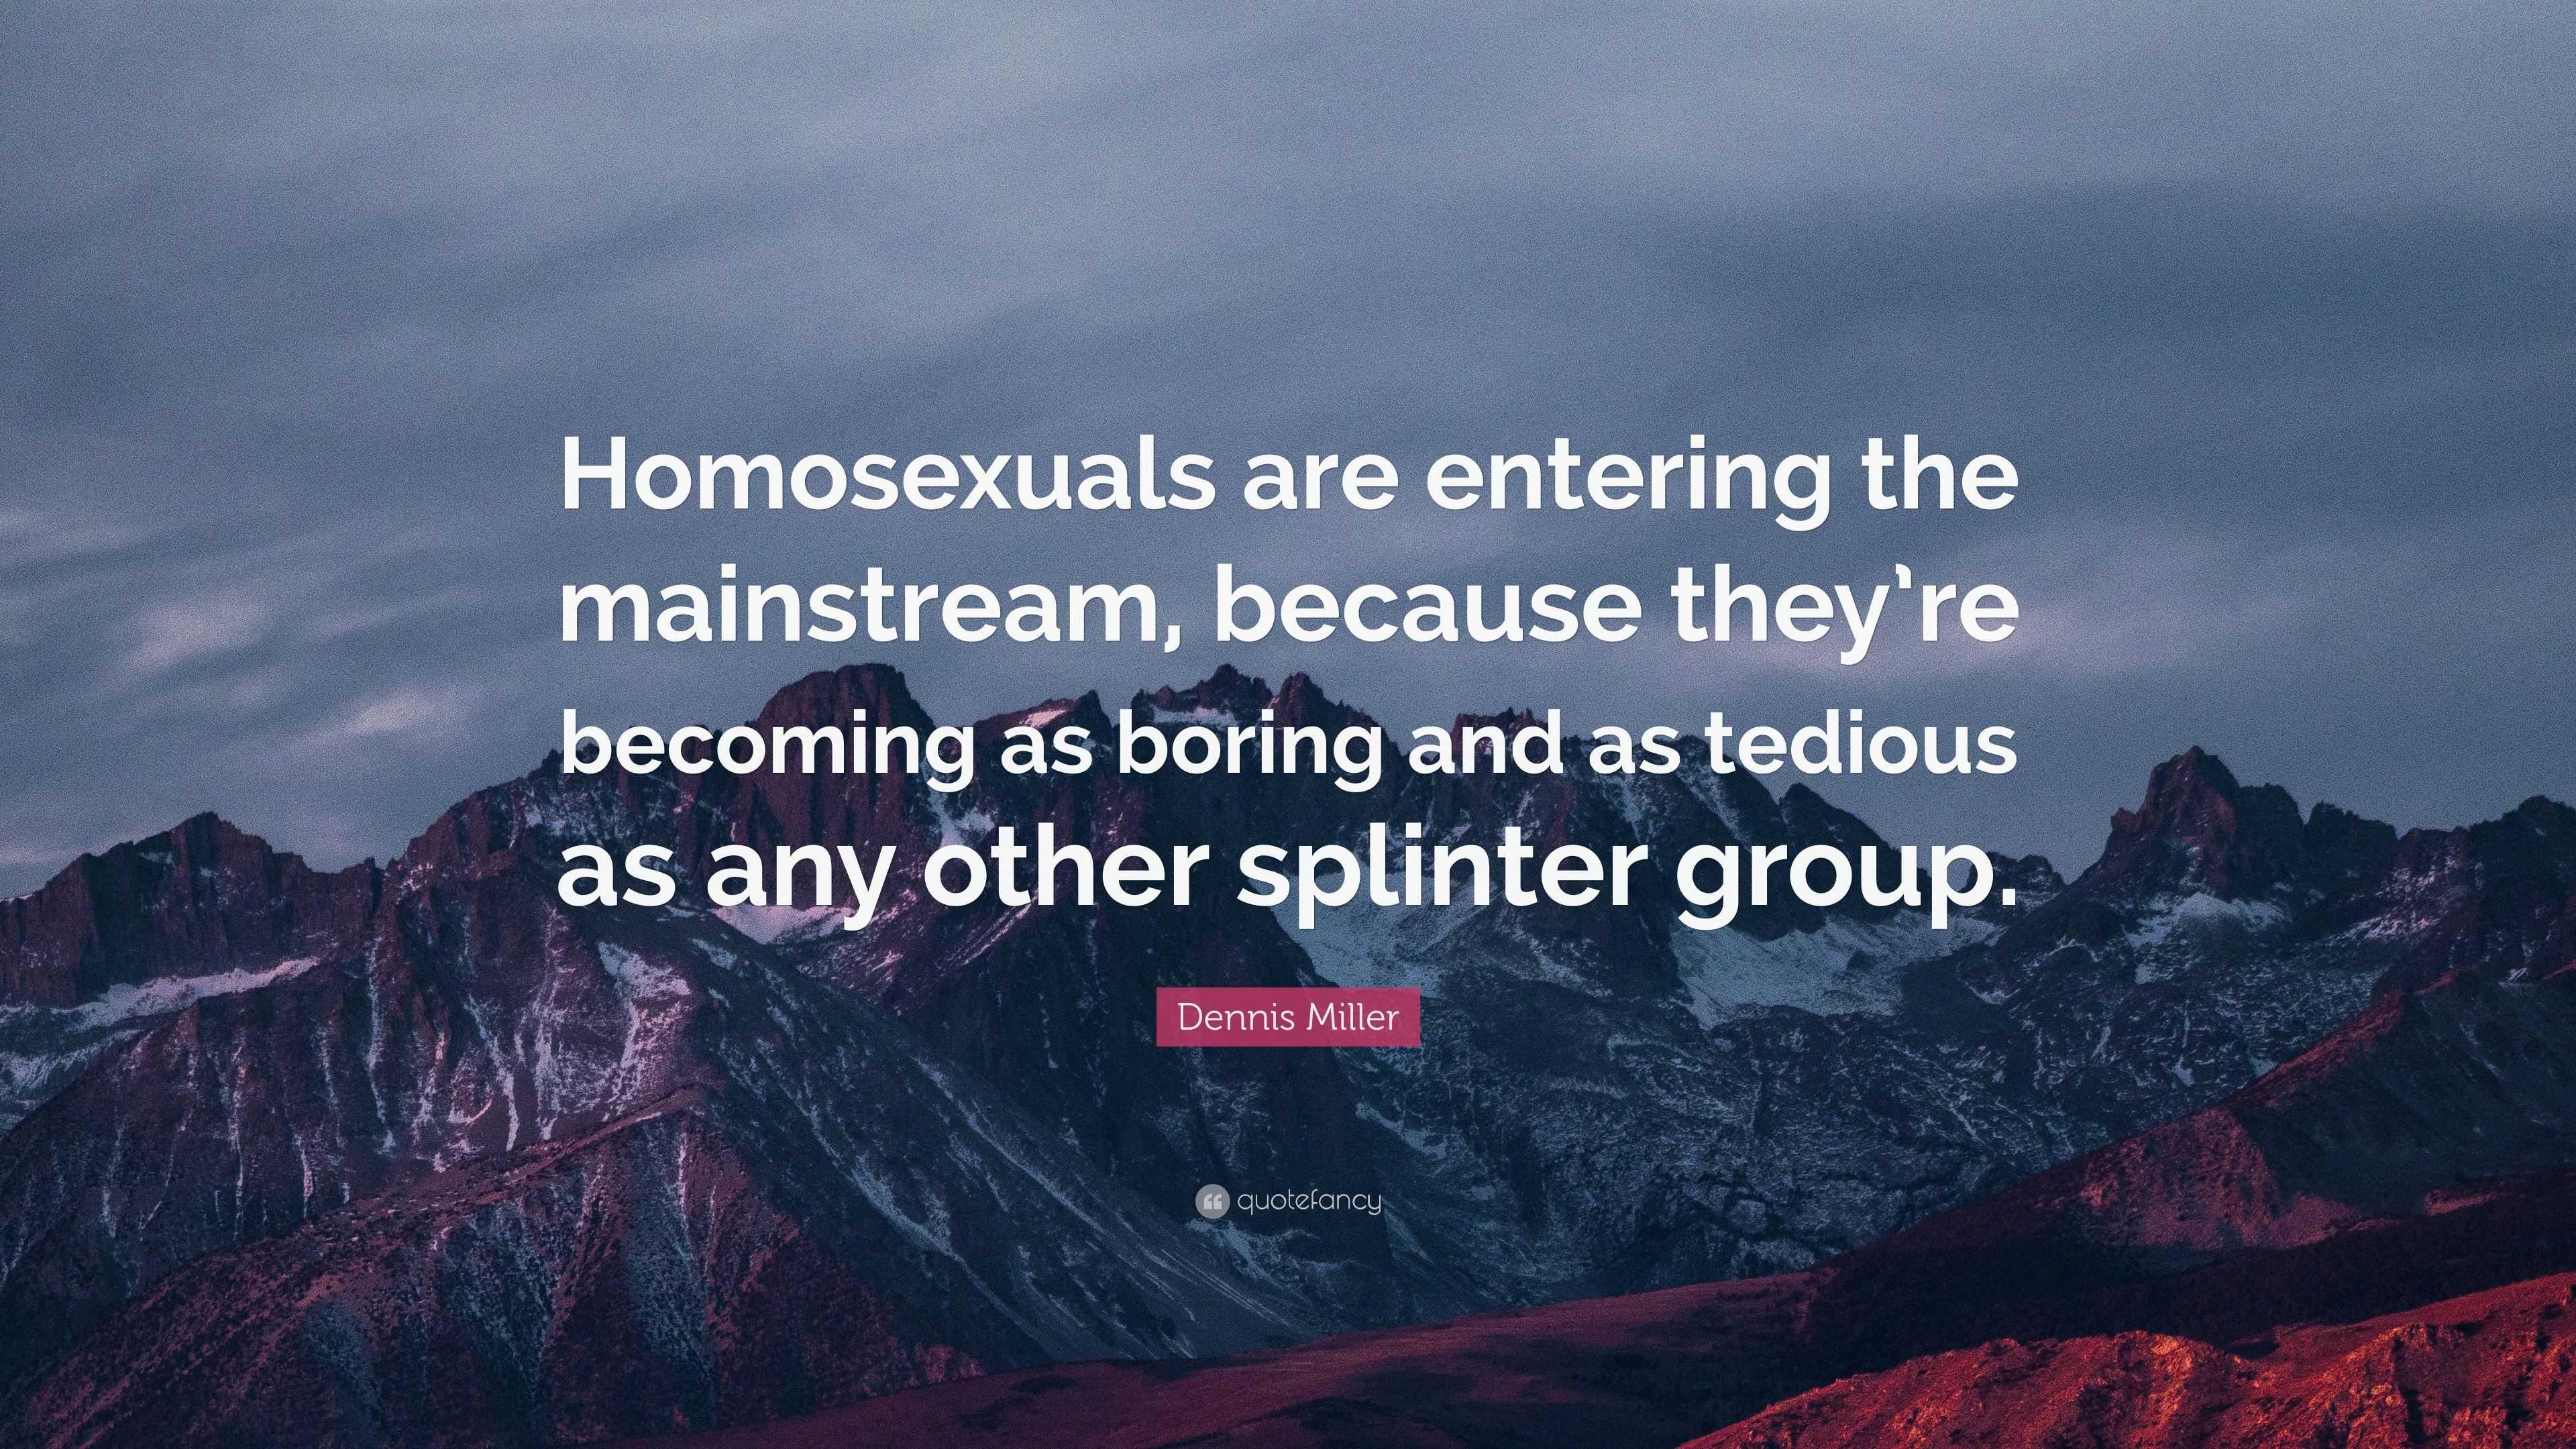 Monosexuals are boring